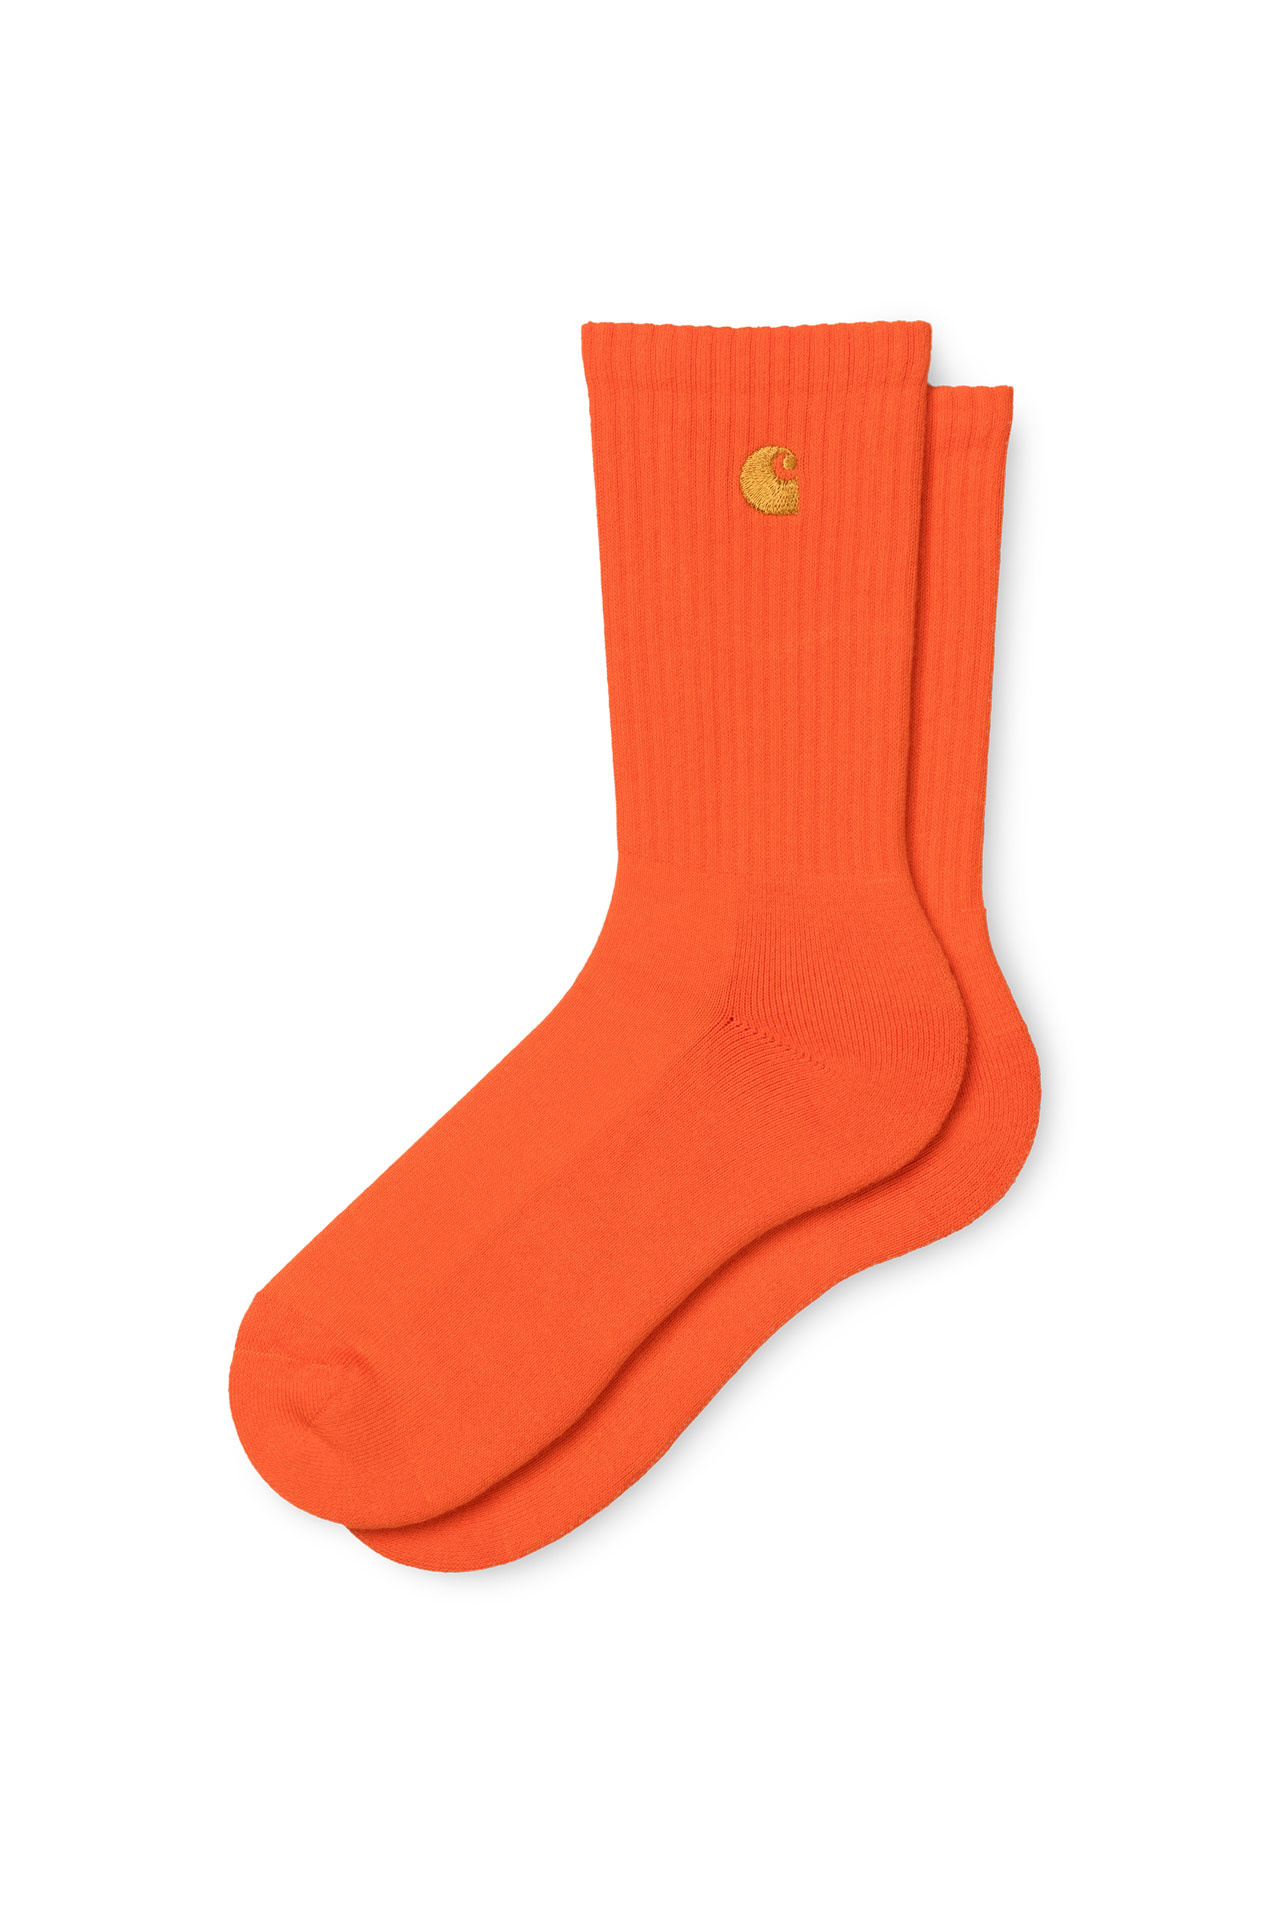 Foto van Carhartt Sokken Chase Socks Safety Orange / Gold I026527